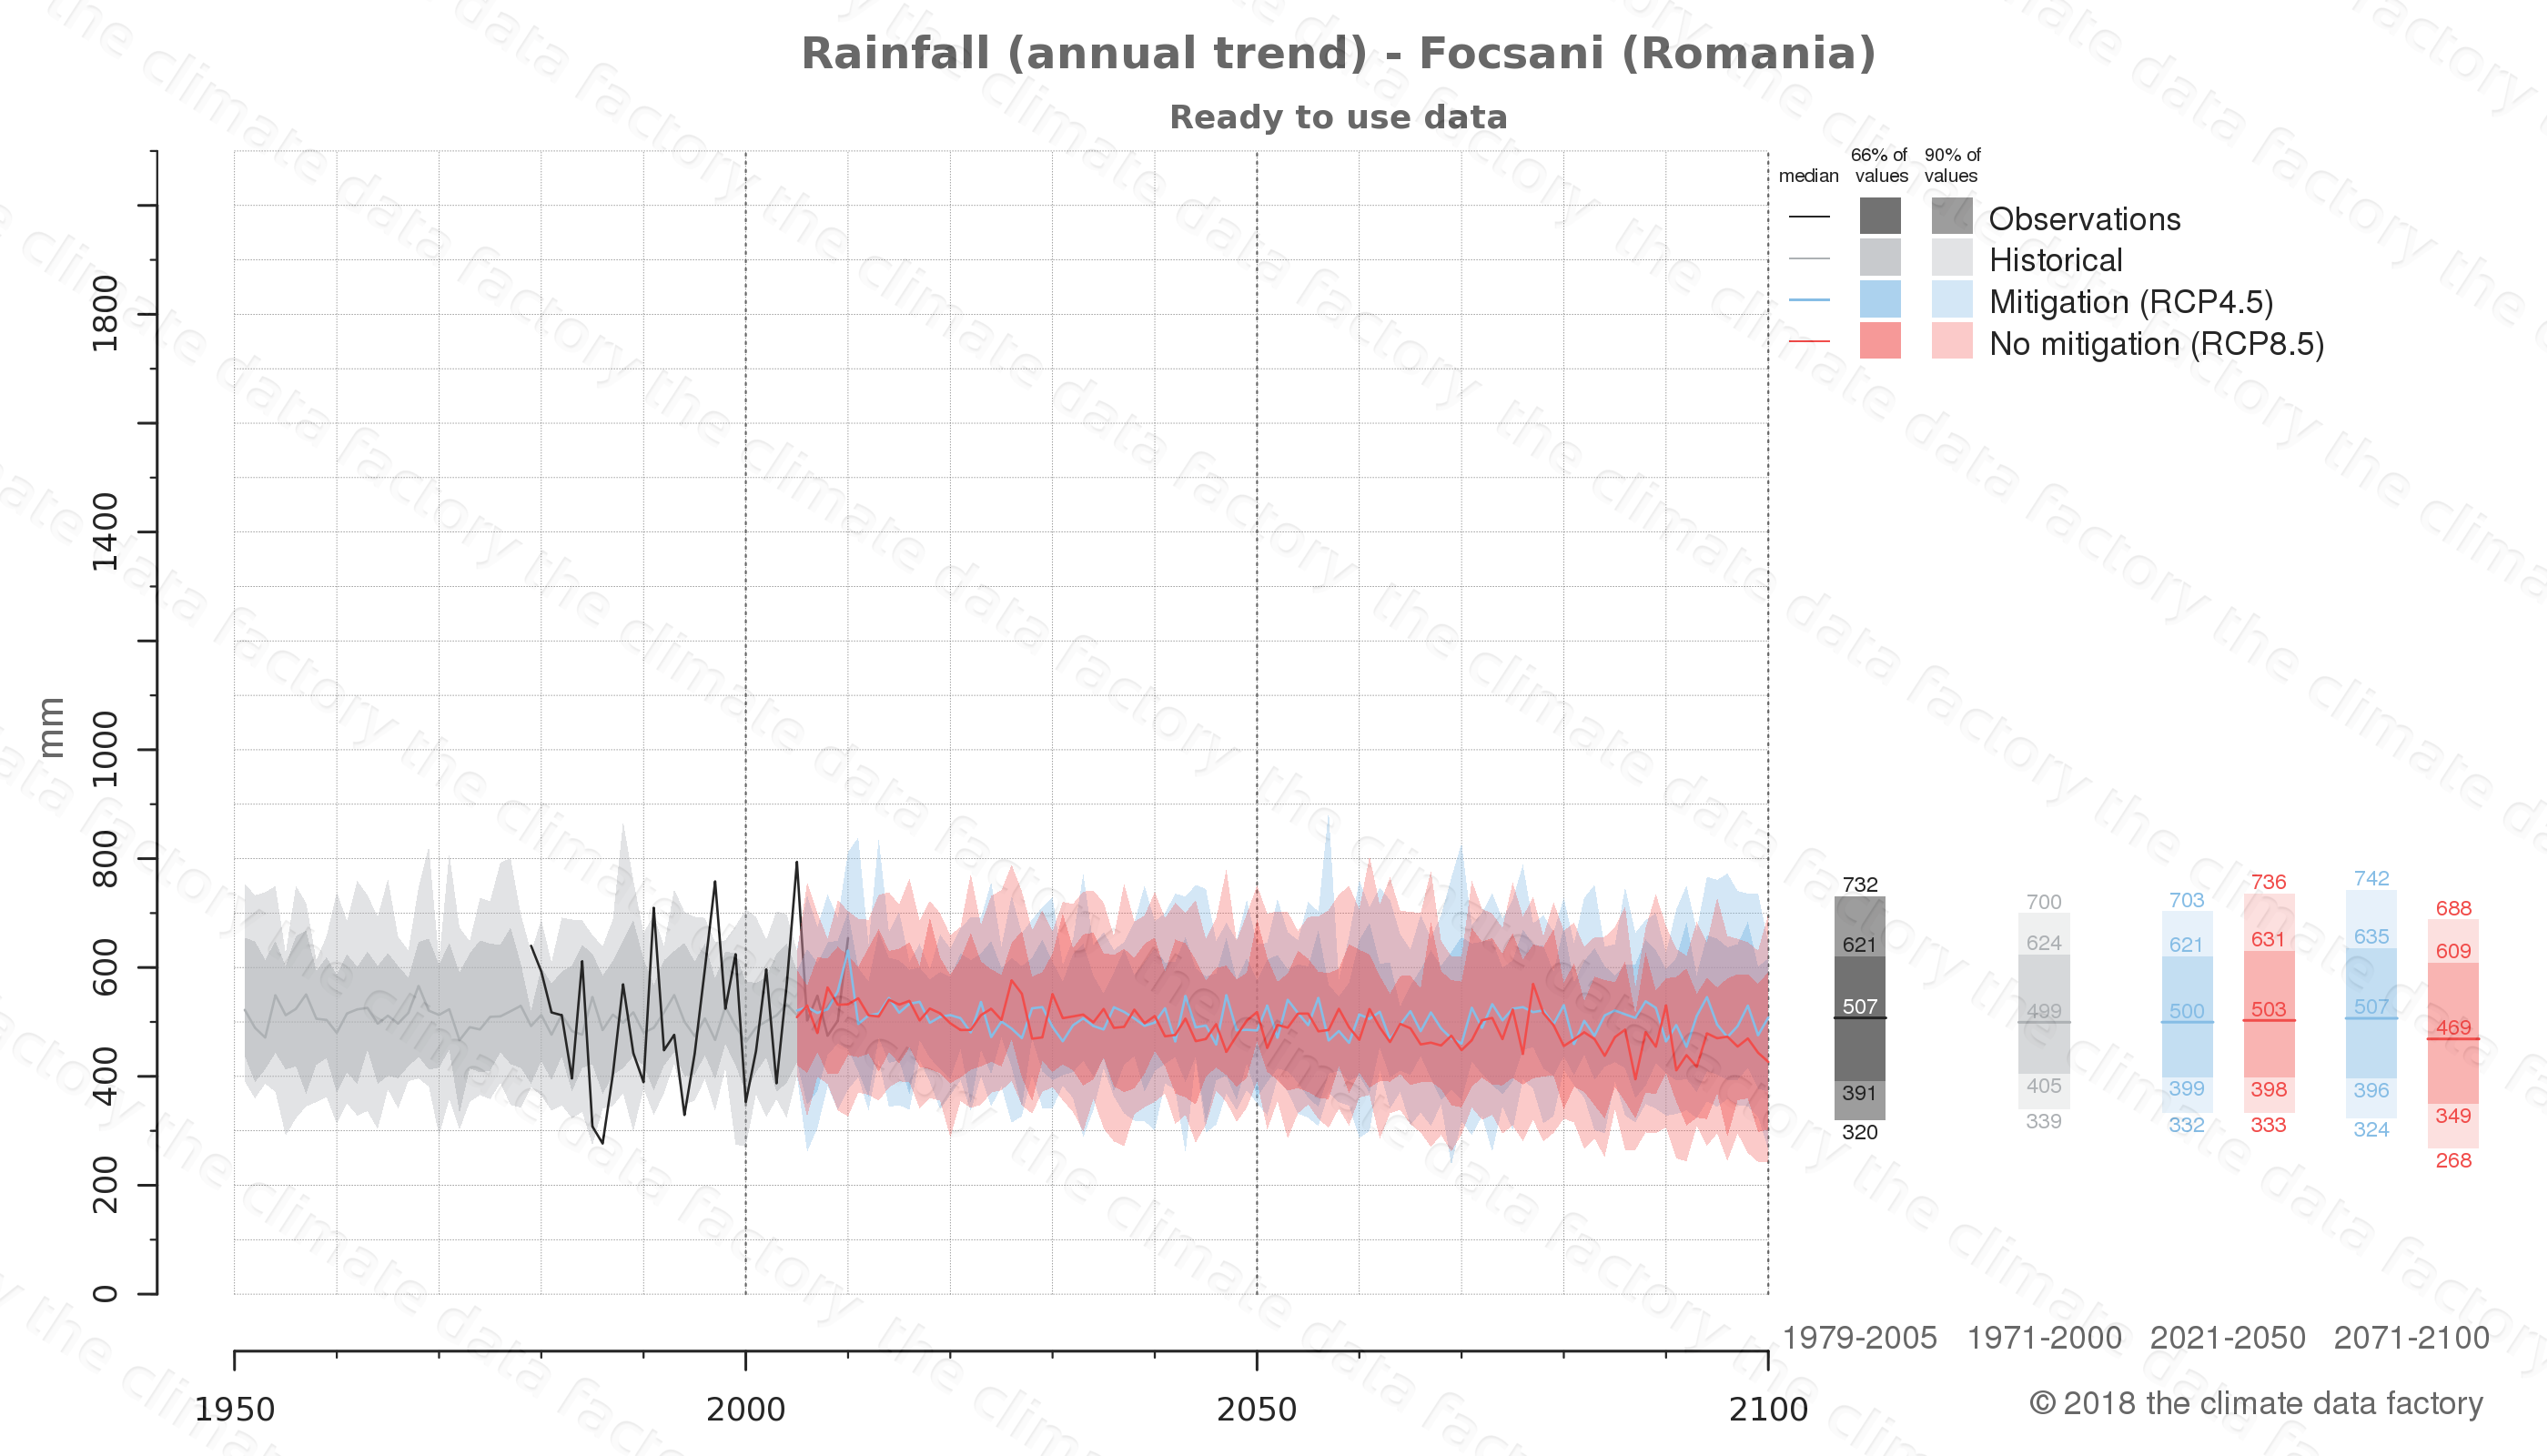 climate change data policy adaptation climate graph city data rainfall focsani romania